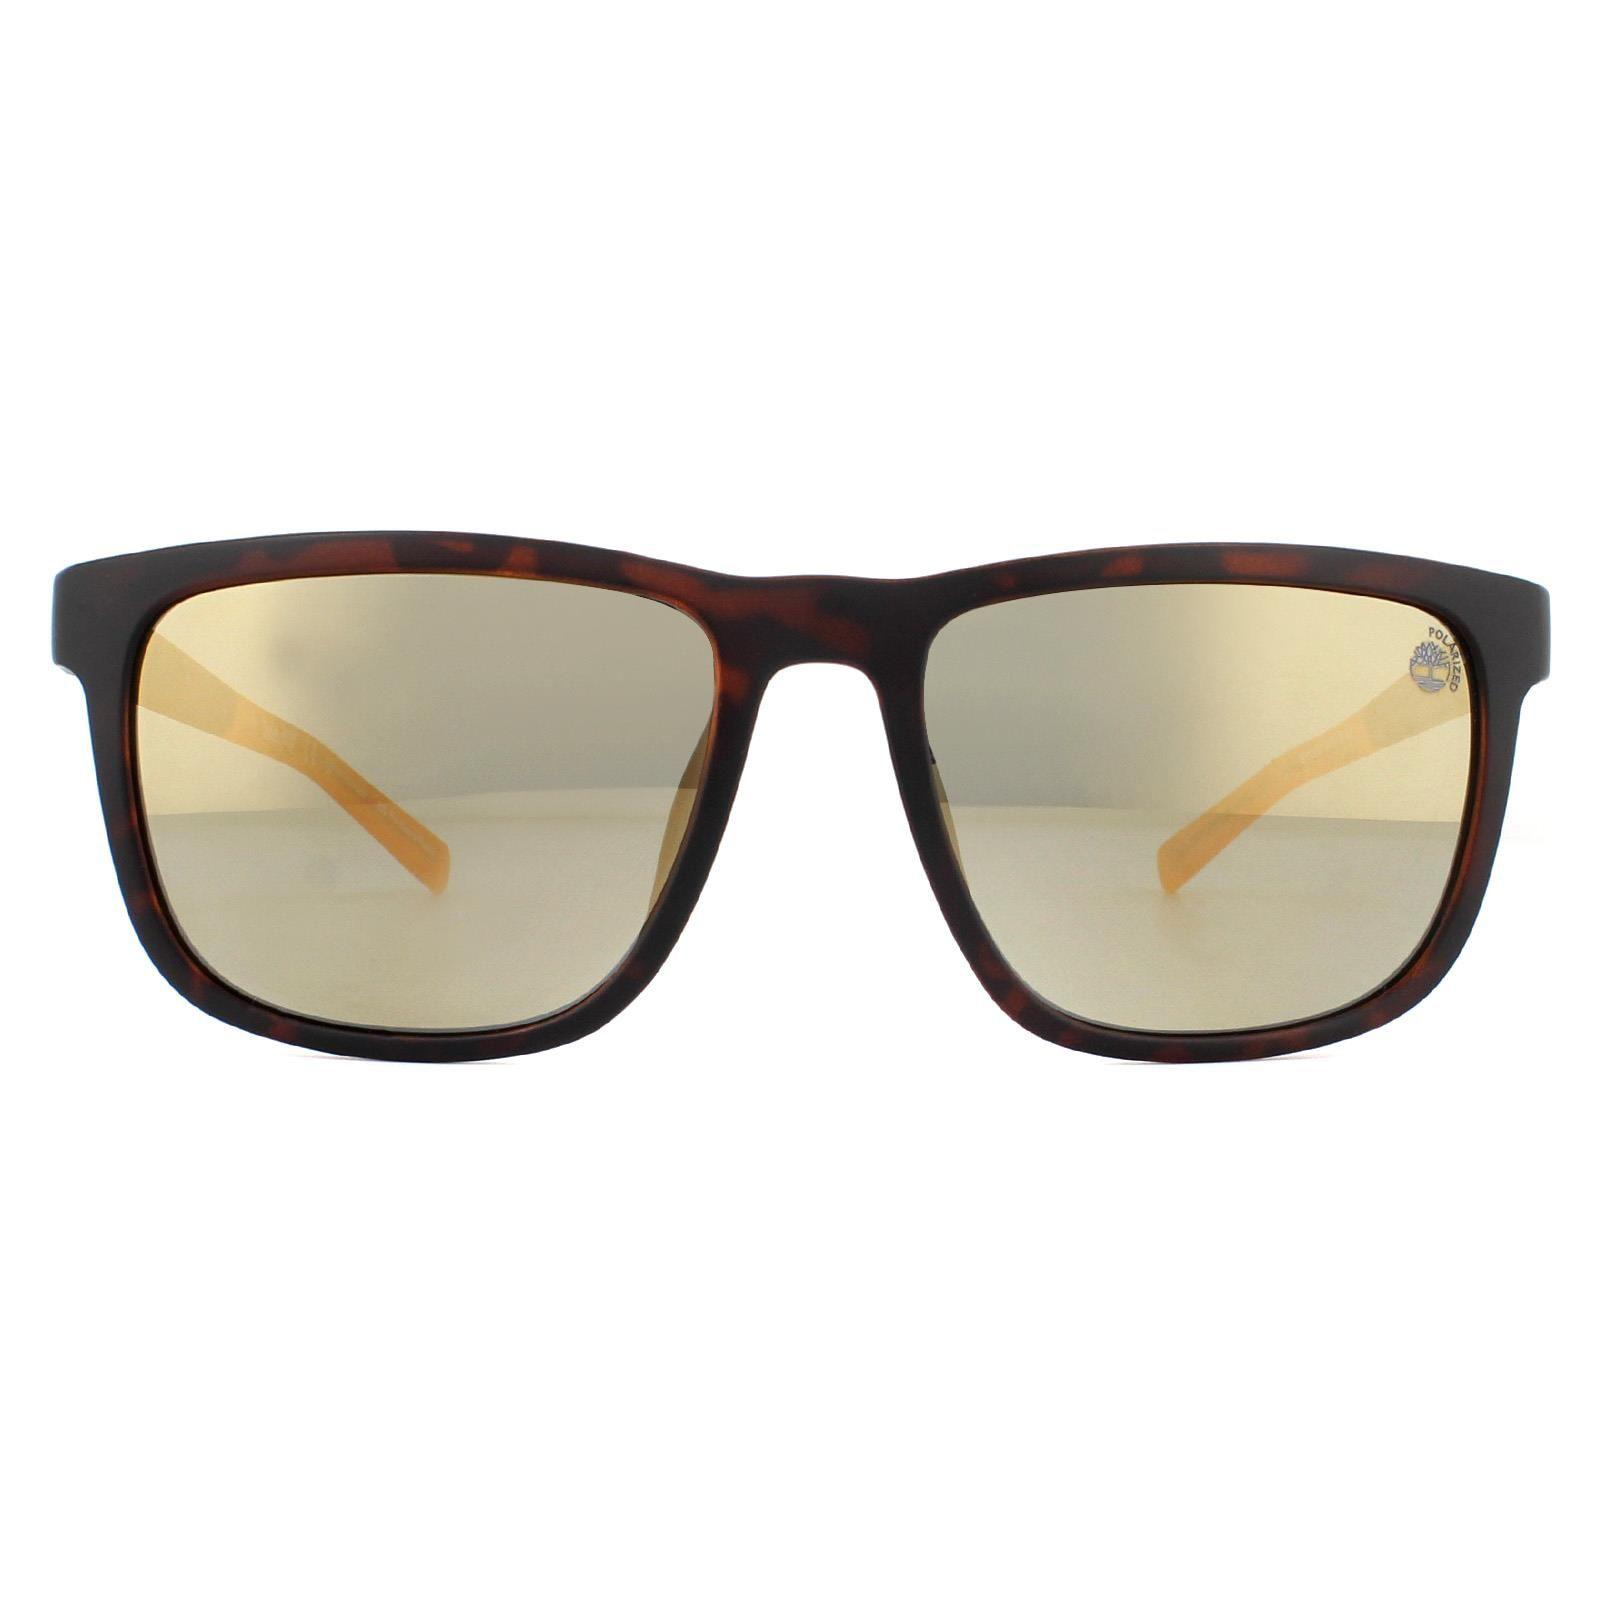 Timberland Sunglasses TB9162 52H Dark Havana Brown Polarized